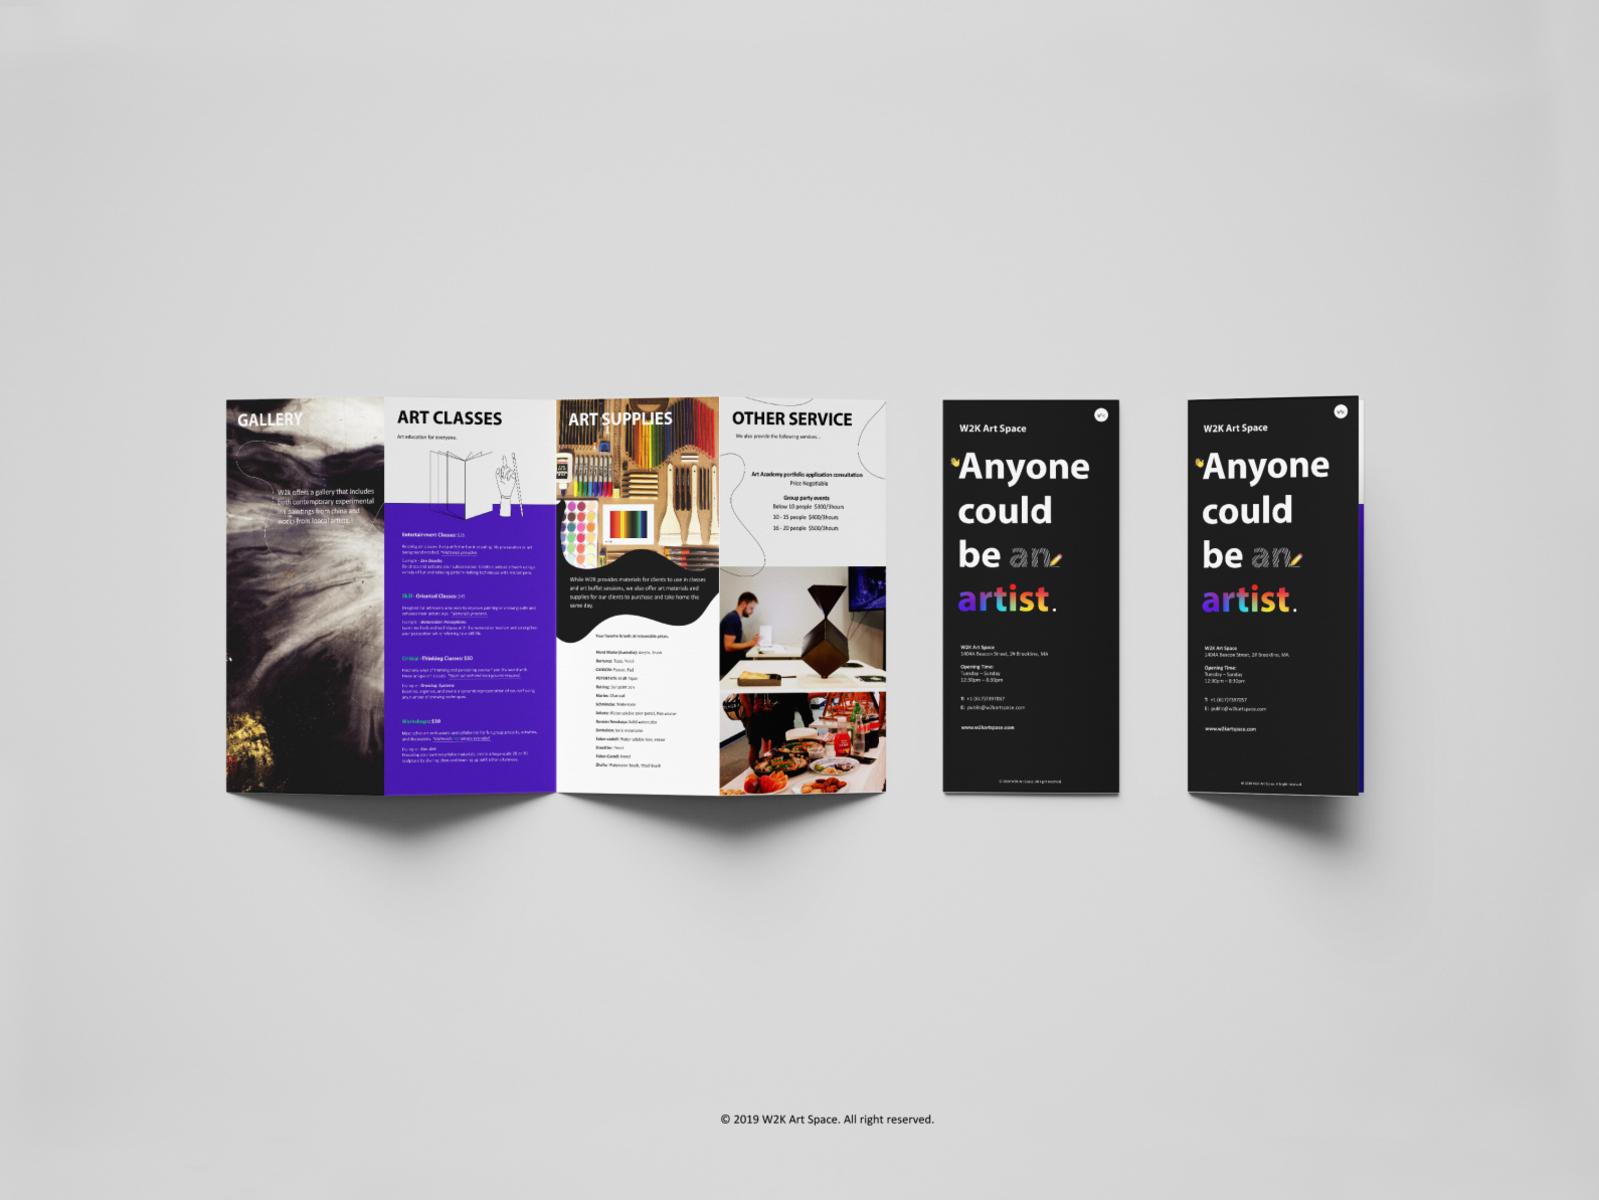 w2k art space handbook by Lingxi on Dribbble